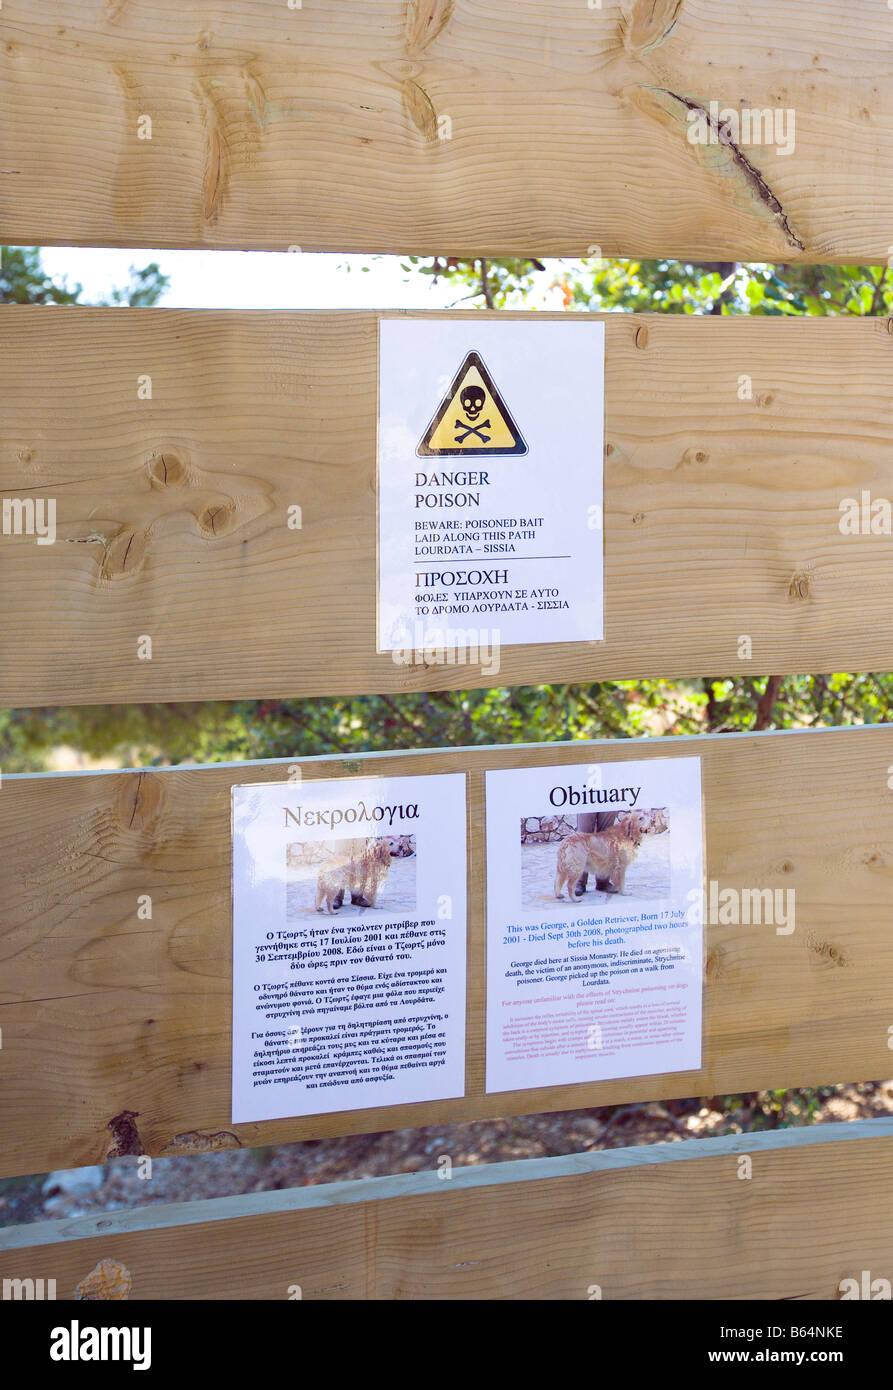 Poison Warning Notice on the Lourdata - Sissia path, Kefalonia, Greece, Europe - Stock Image